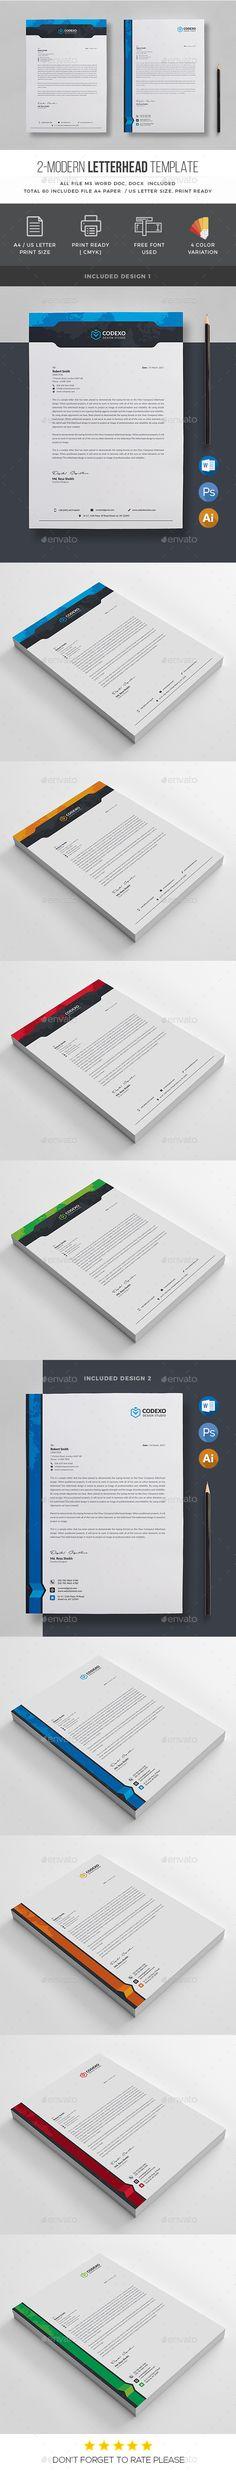 Letterhead Stationery printing Print templates